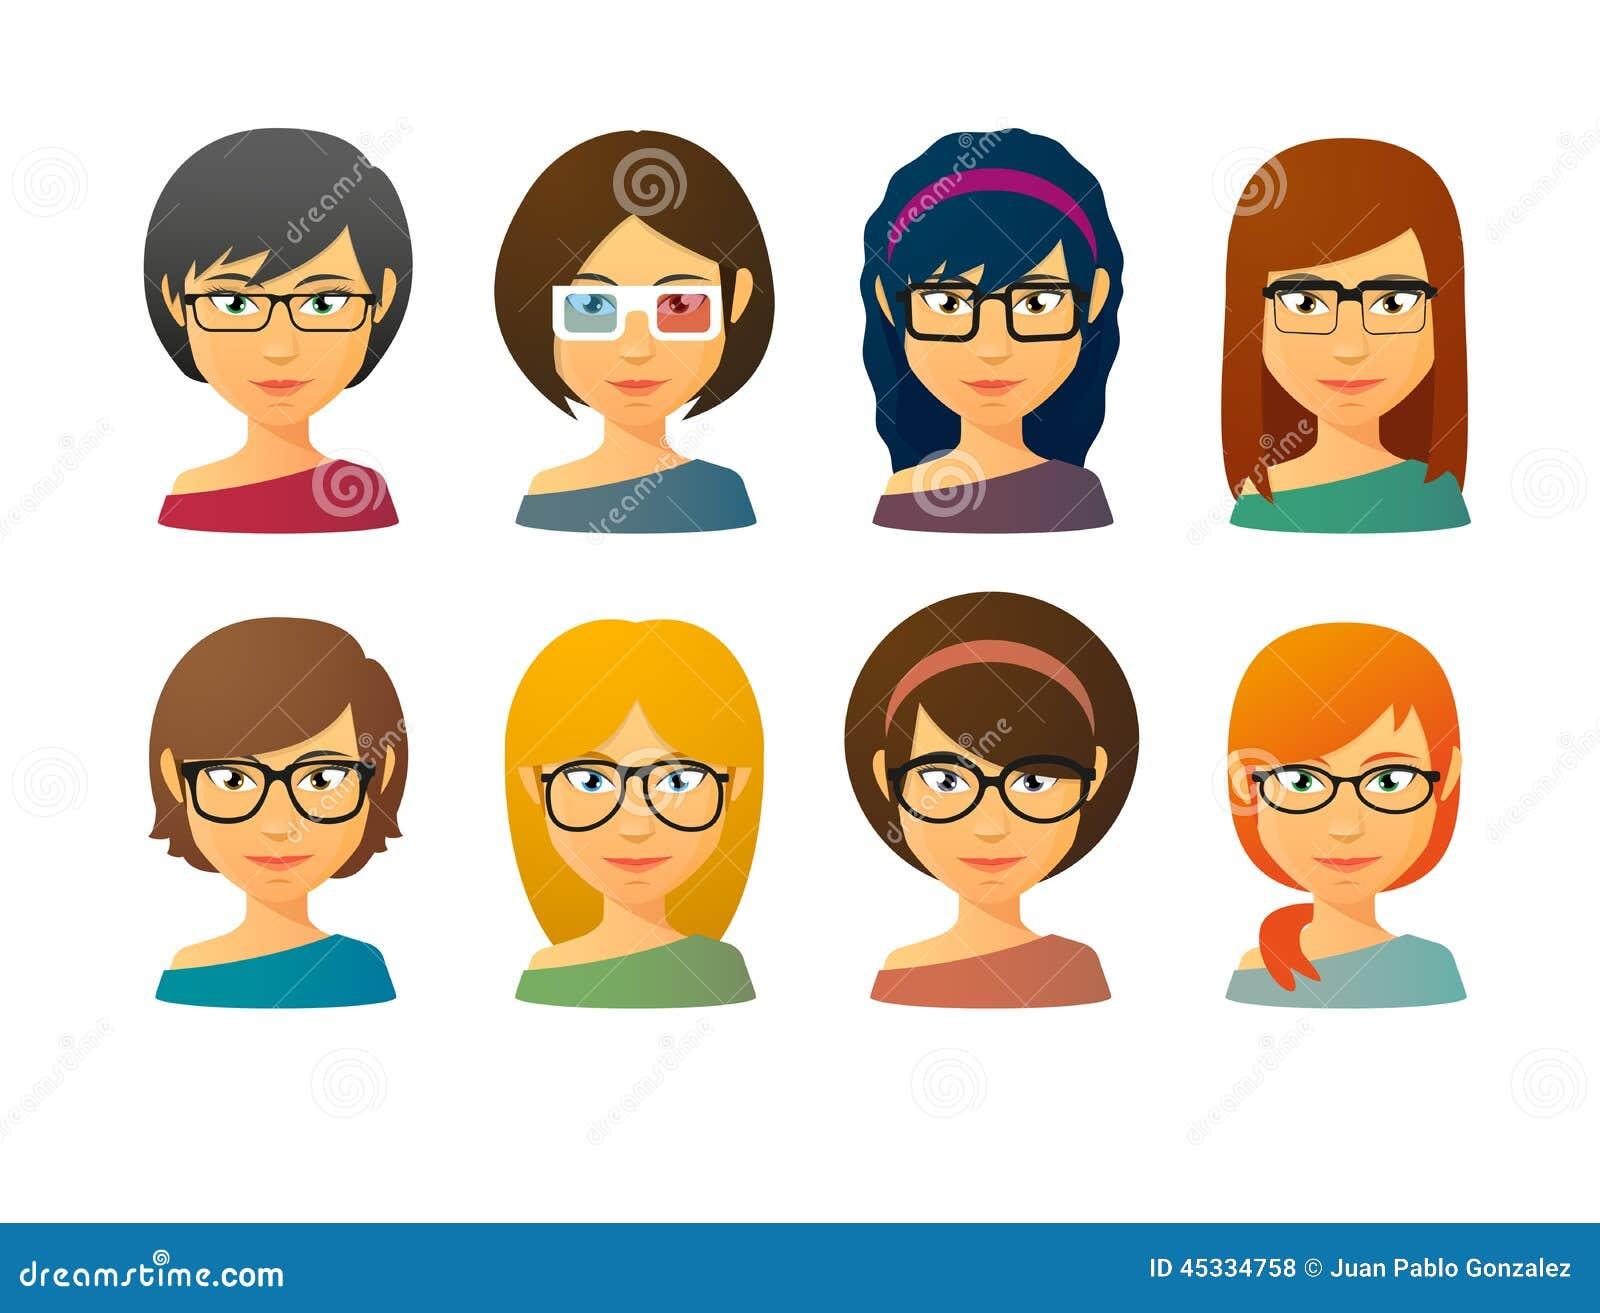 Where Women Create Set of 4 2010 Feb-Apr, May-Jul, Aug-Oct, Nov-Jan